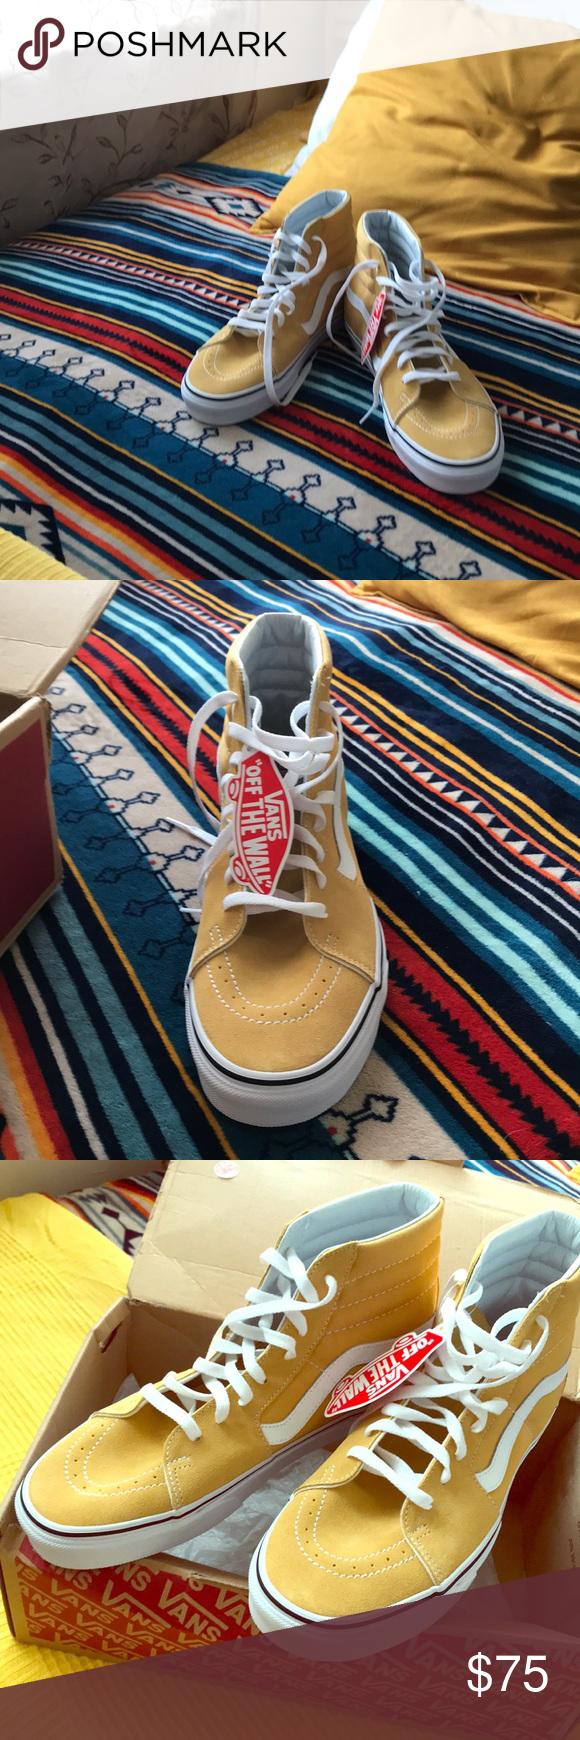 Vans Old Skool high top shoes size 12